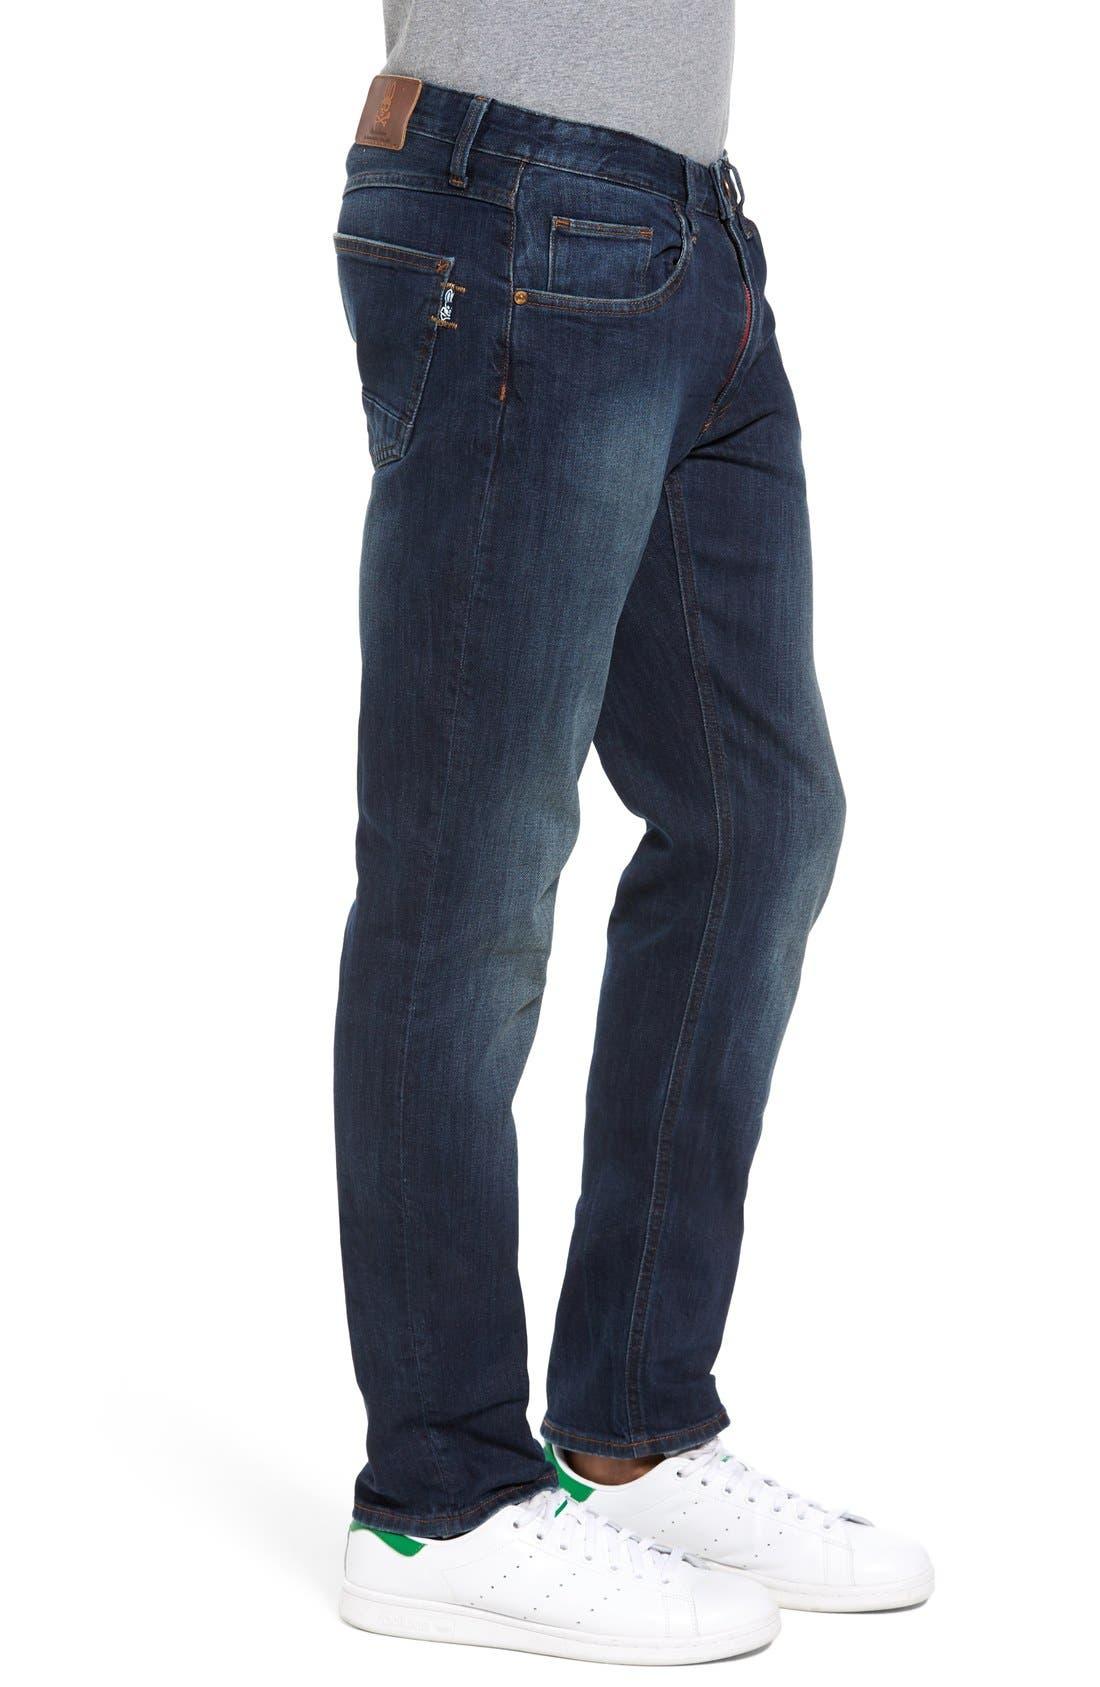 Spitfire Slim Fit Jeans,                             Alternate thumbnail 3, color,                             Indigo